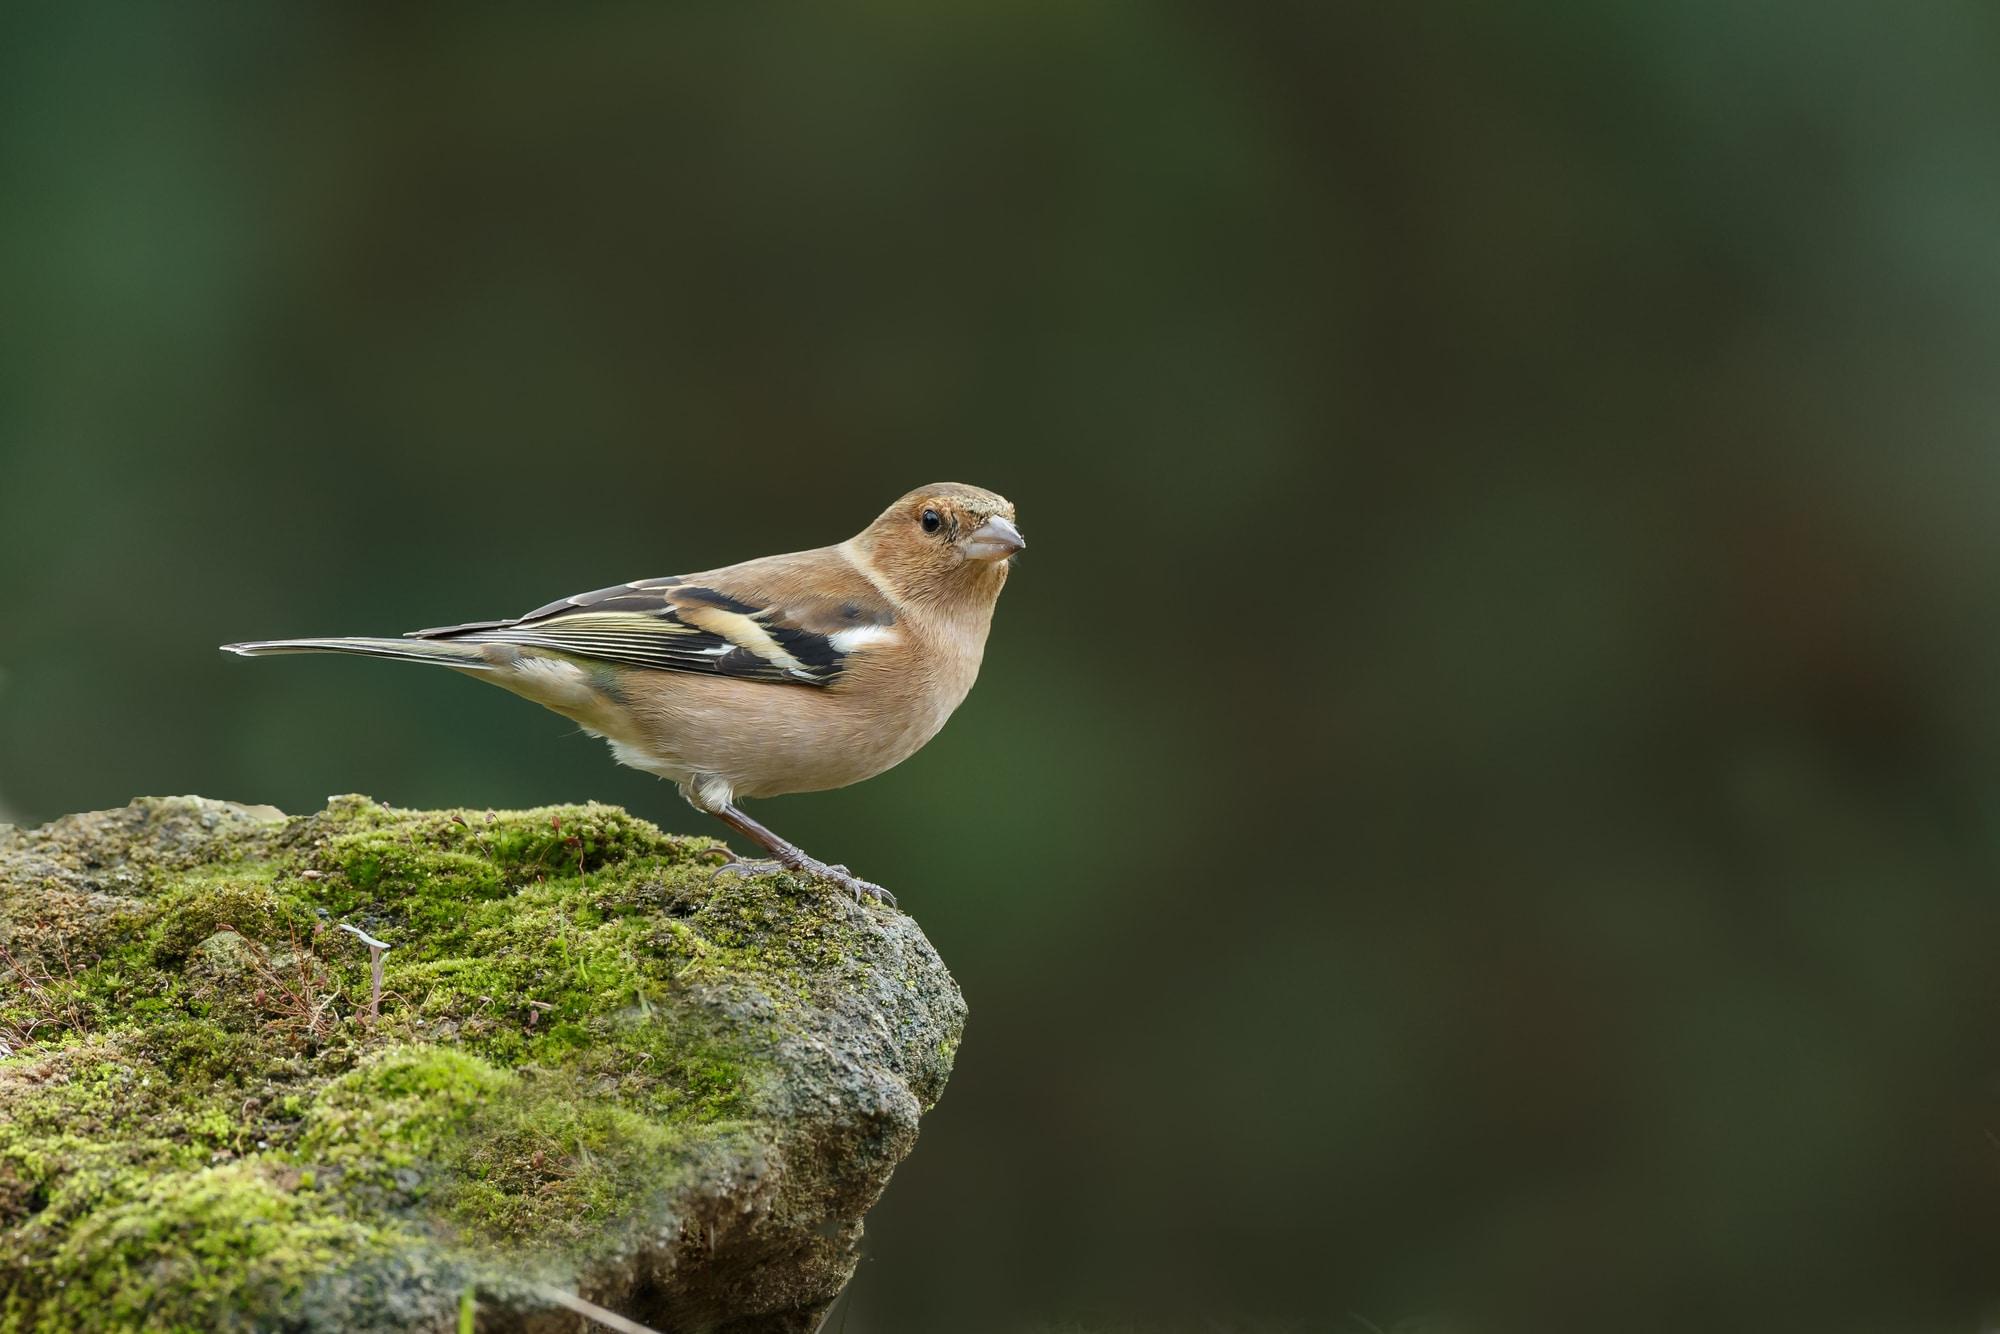 A female chaffinch on a rock edge